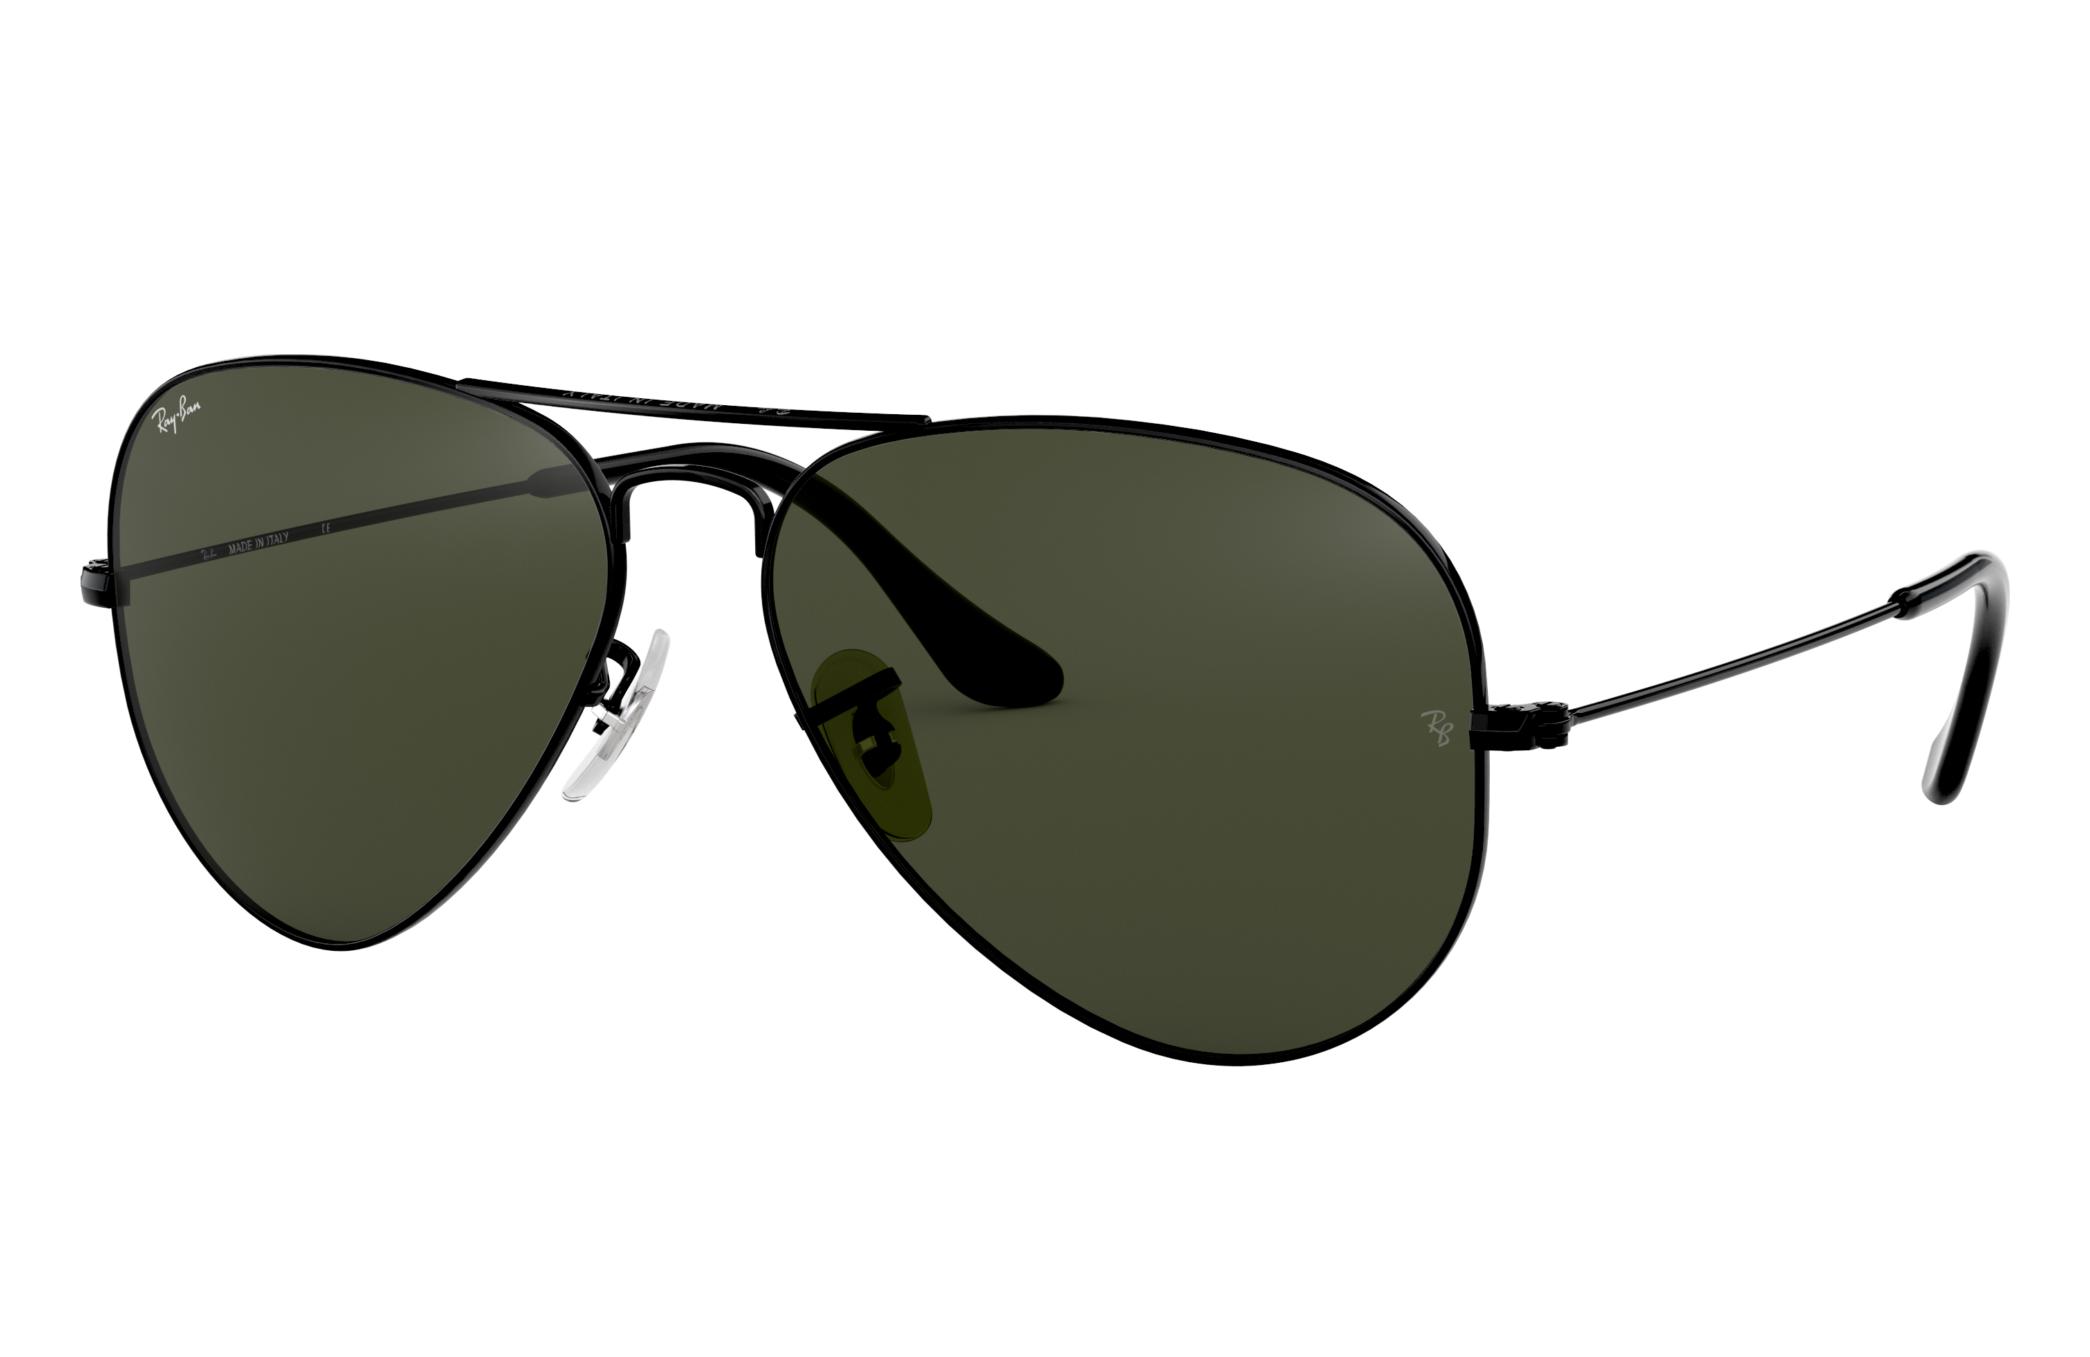 Ray-Ban Aviator Classic Black, Green Lenses - RB3025